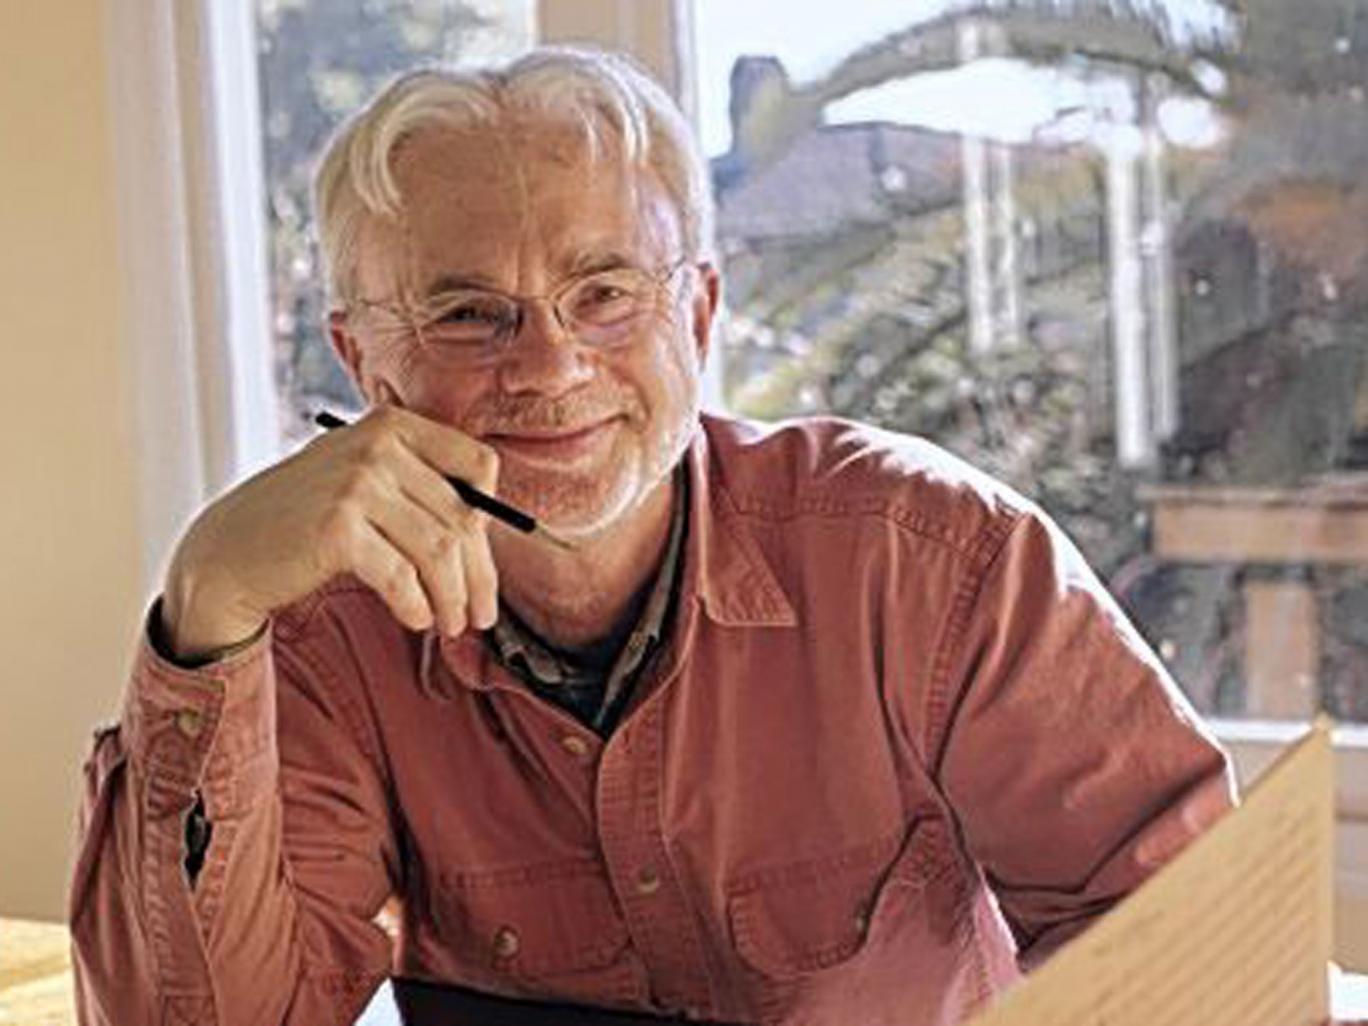 Music maestro: John Adams